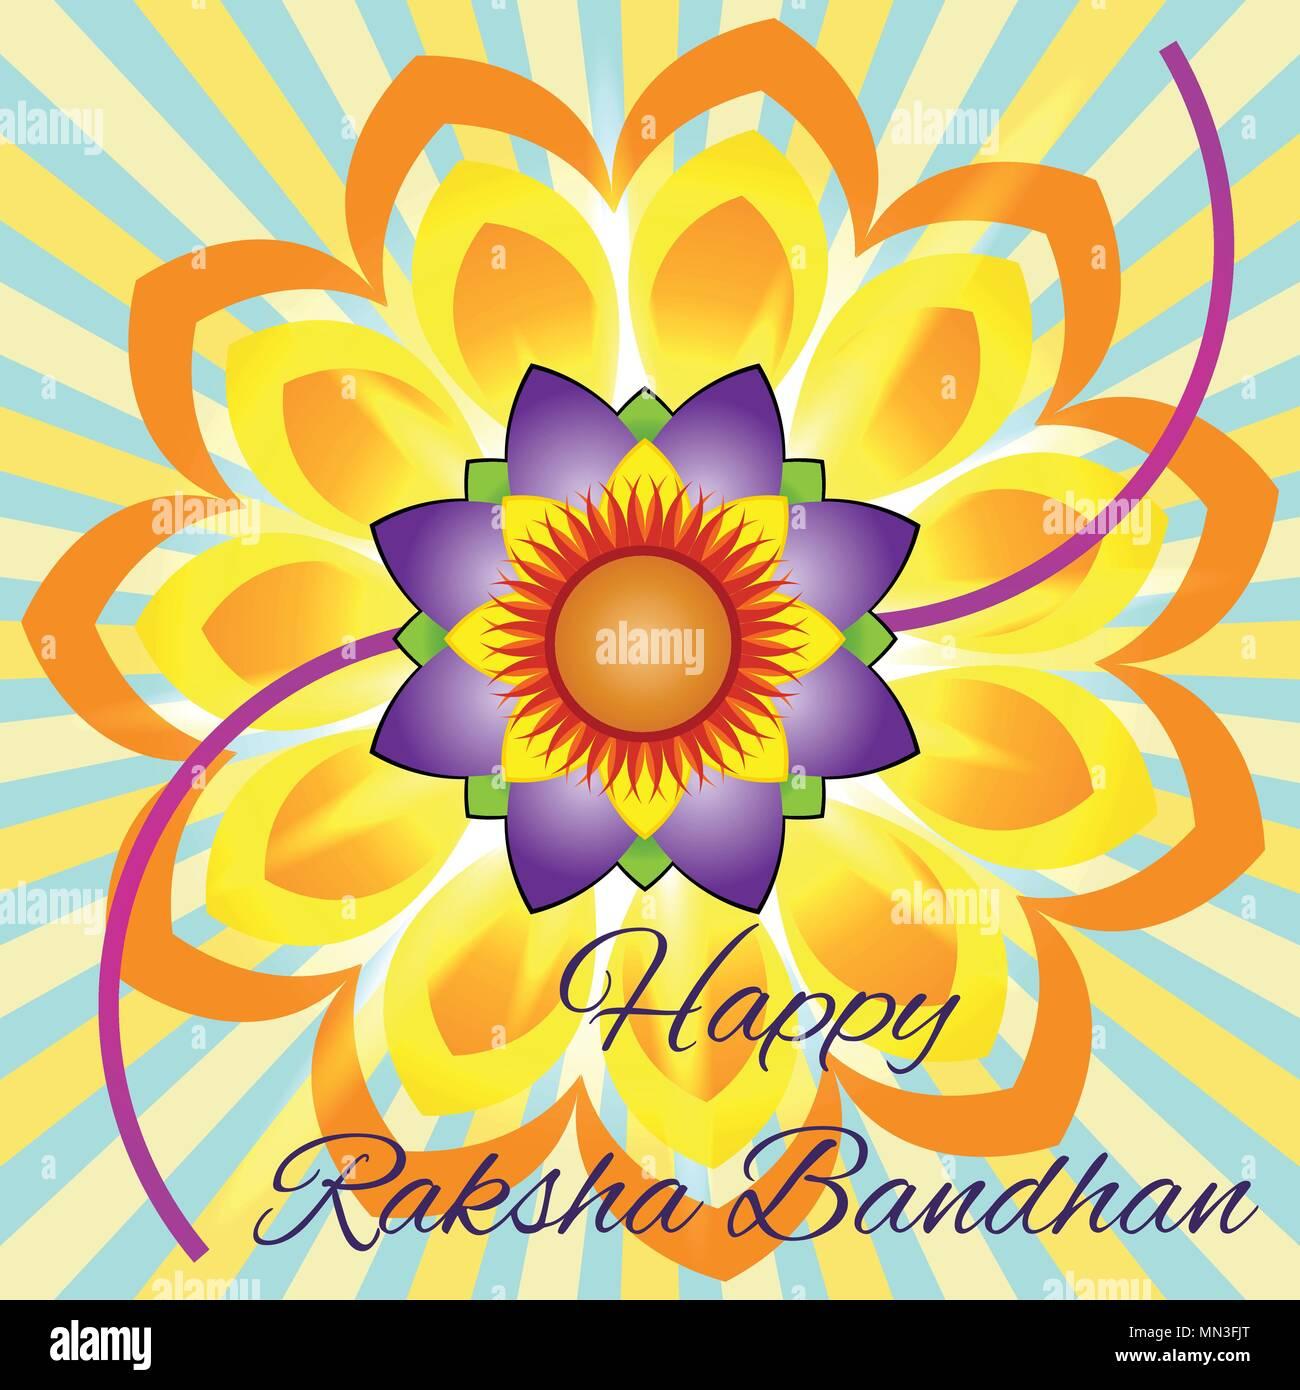 Happy Raksha Bandhan Elegant Greeting Card With Beautiful Rakhi For